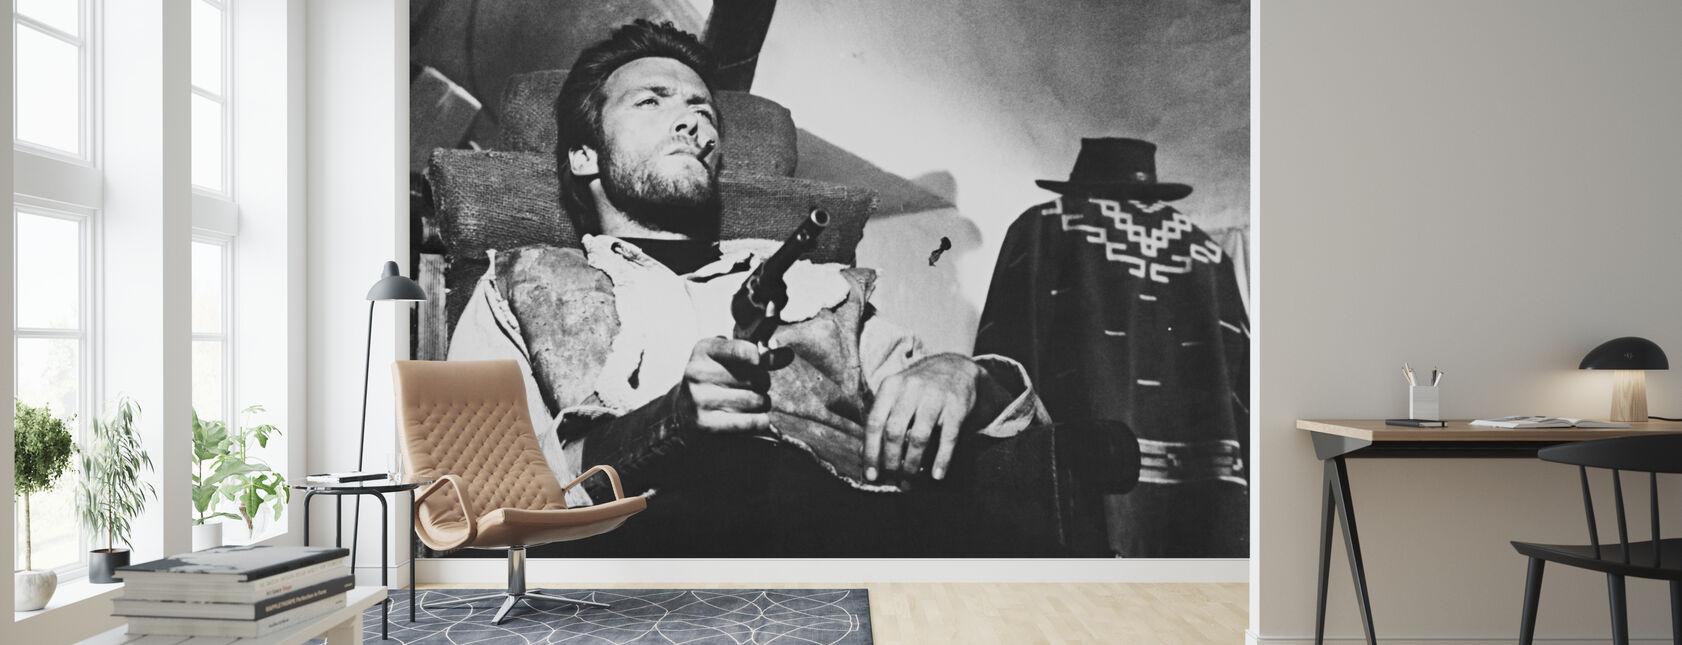 Een paar dollar meer - Clint Eastwood - Behang - Woonkamer